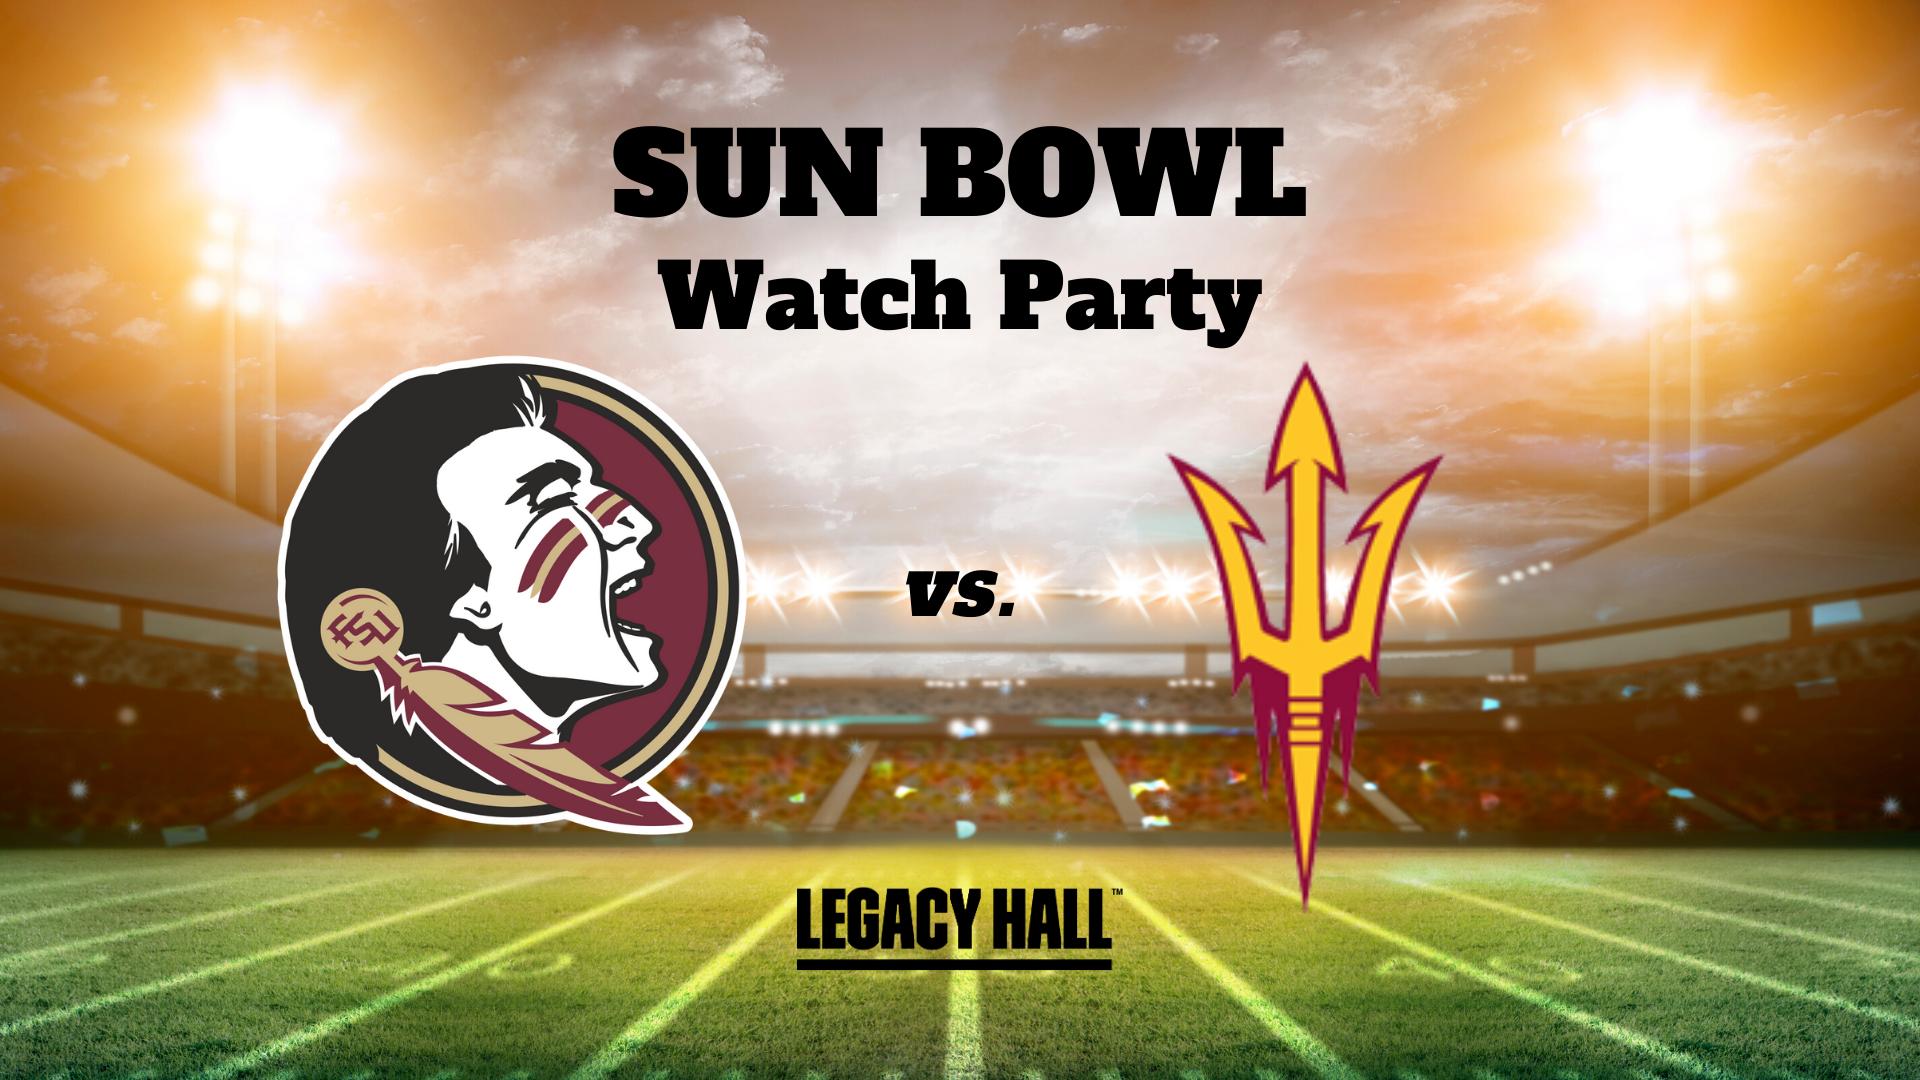 Sun Bowl Watch Party - hero